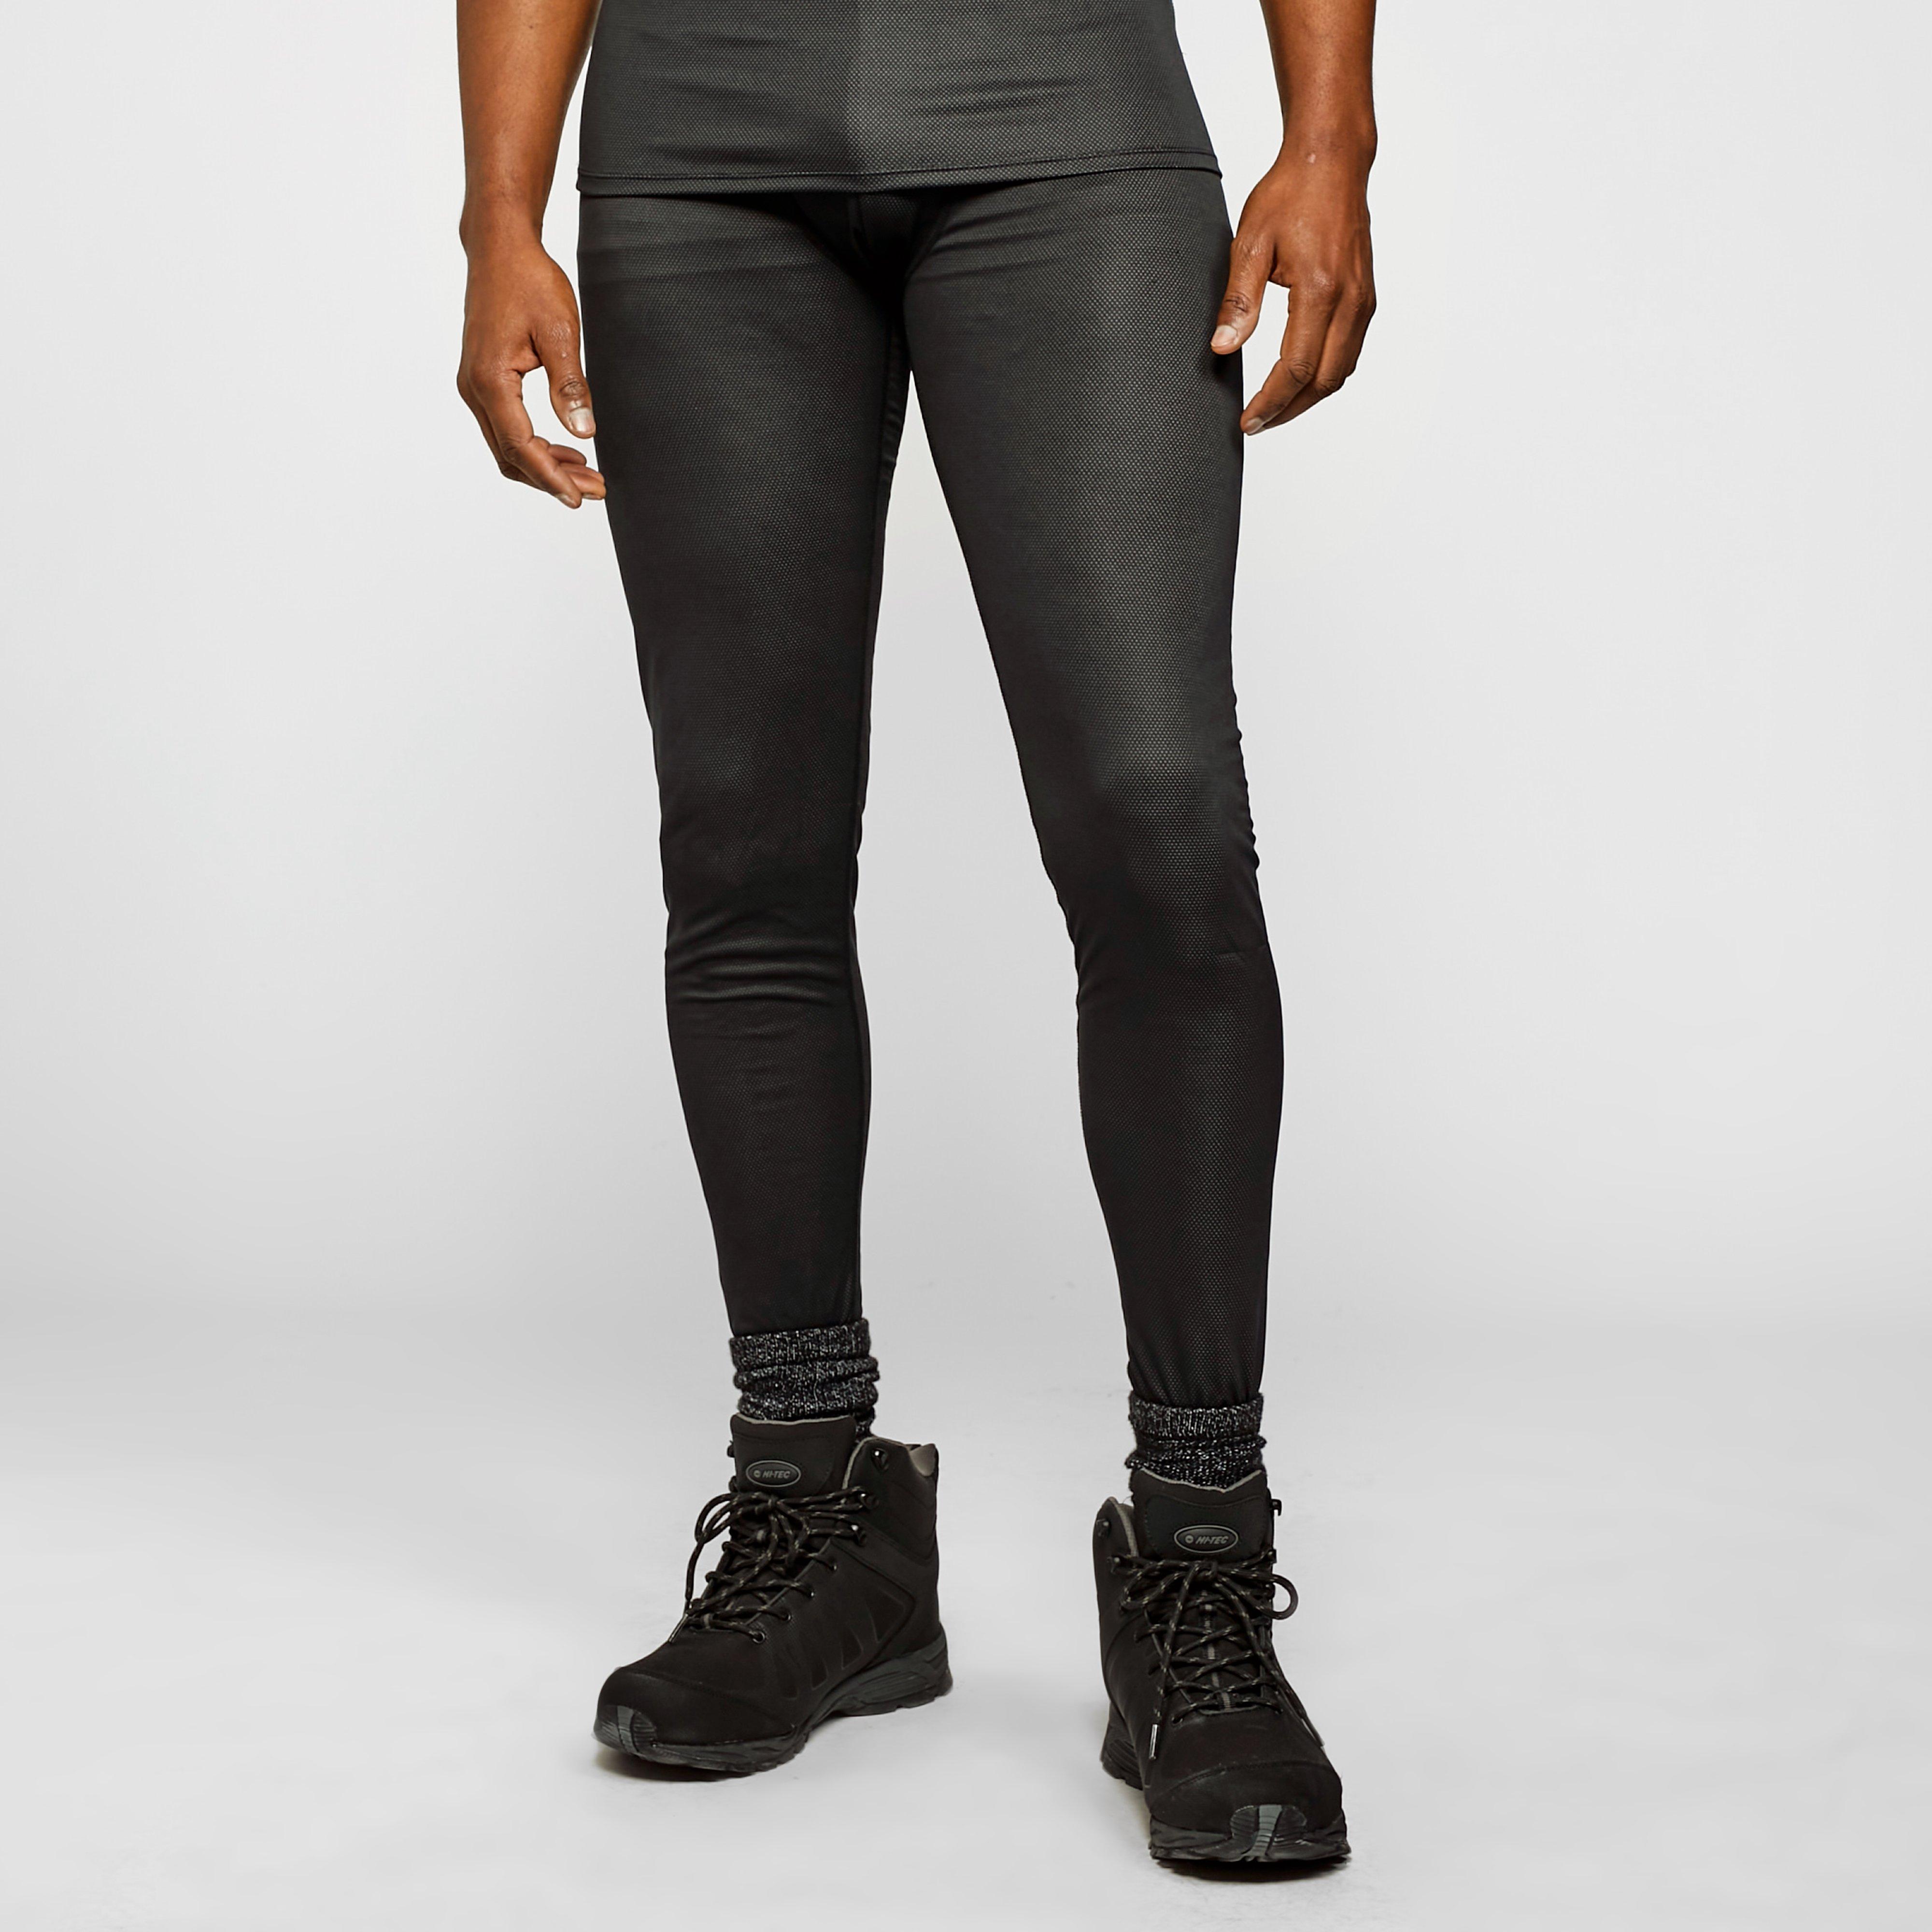 Image of Odlo Men's Active F-Dry Light Eco Baselayer Bottoms - Black/Black, BLACK/BLACK